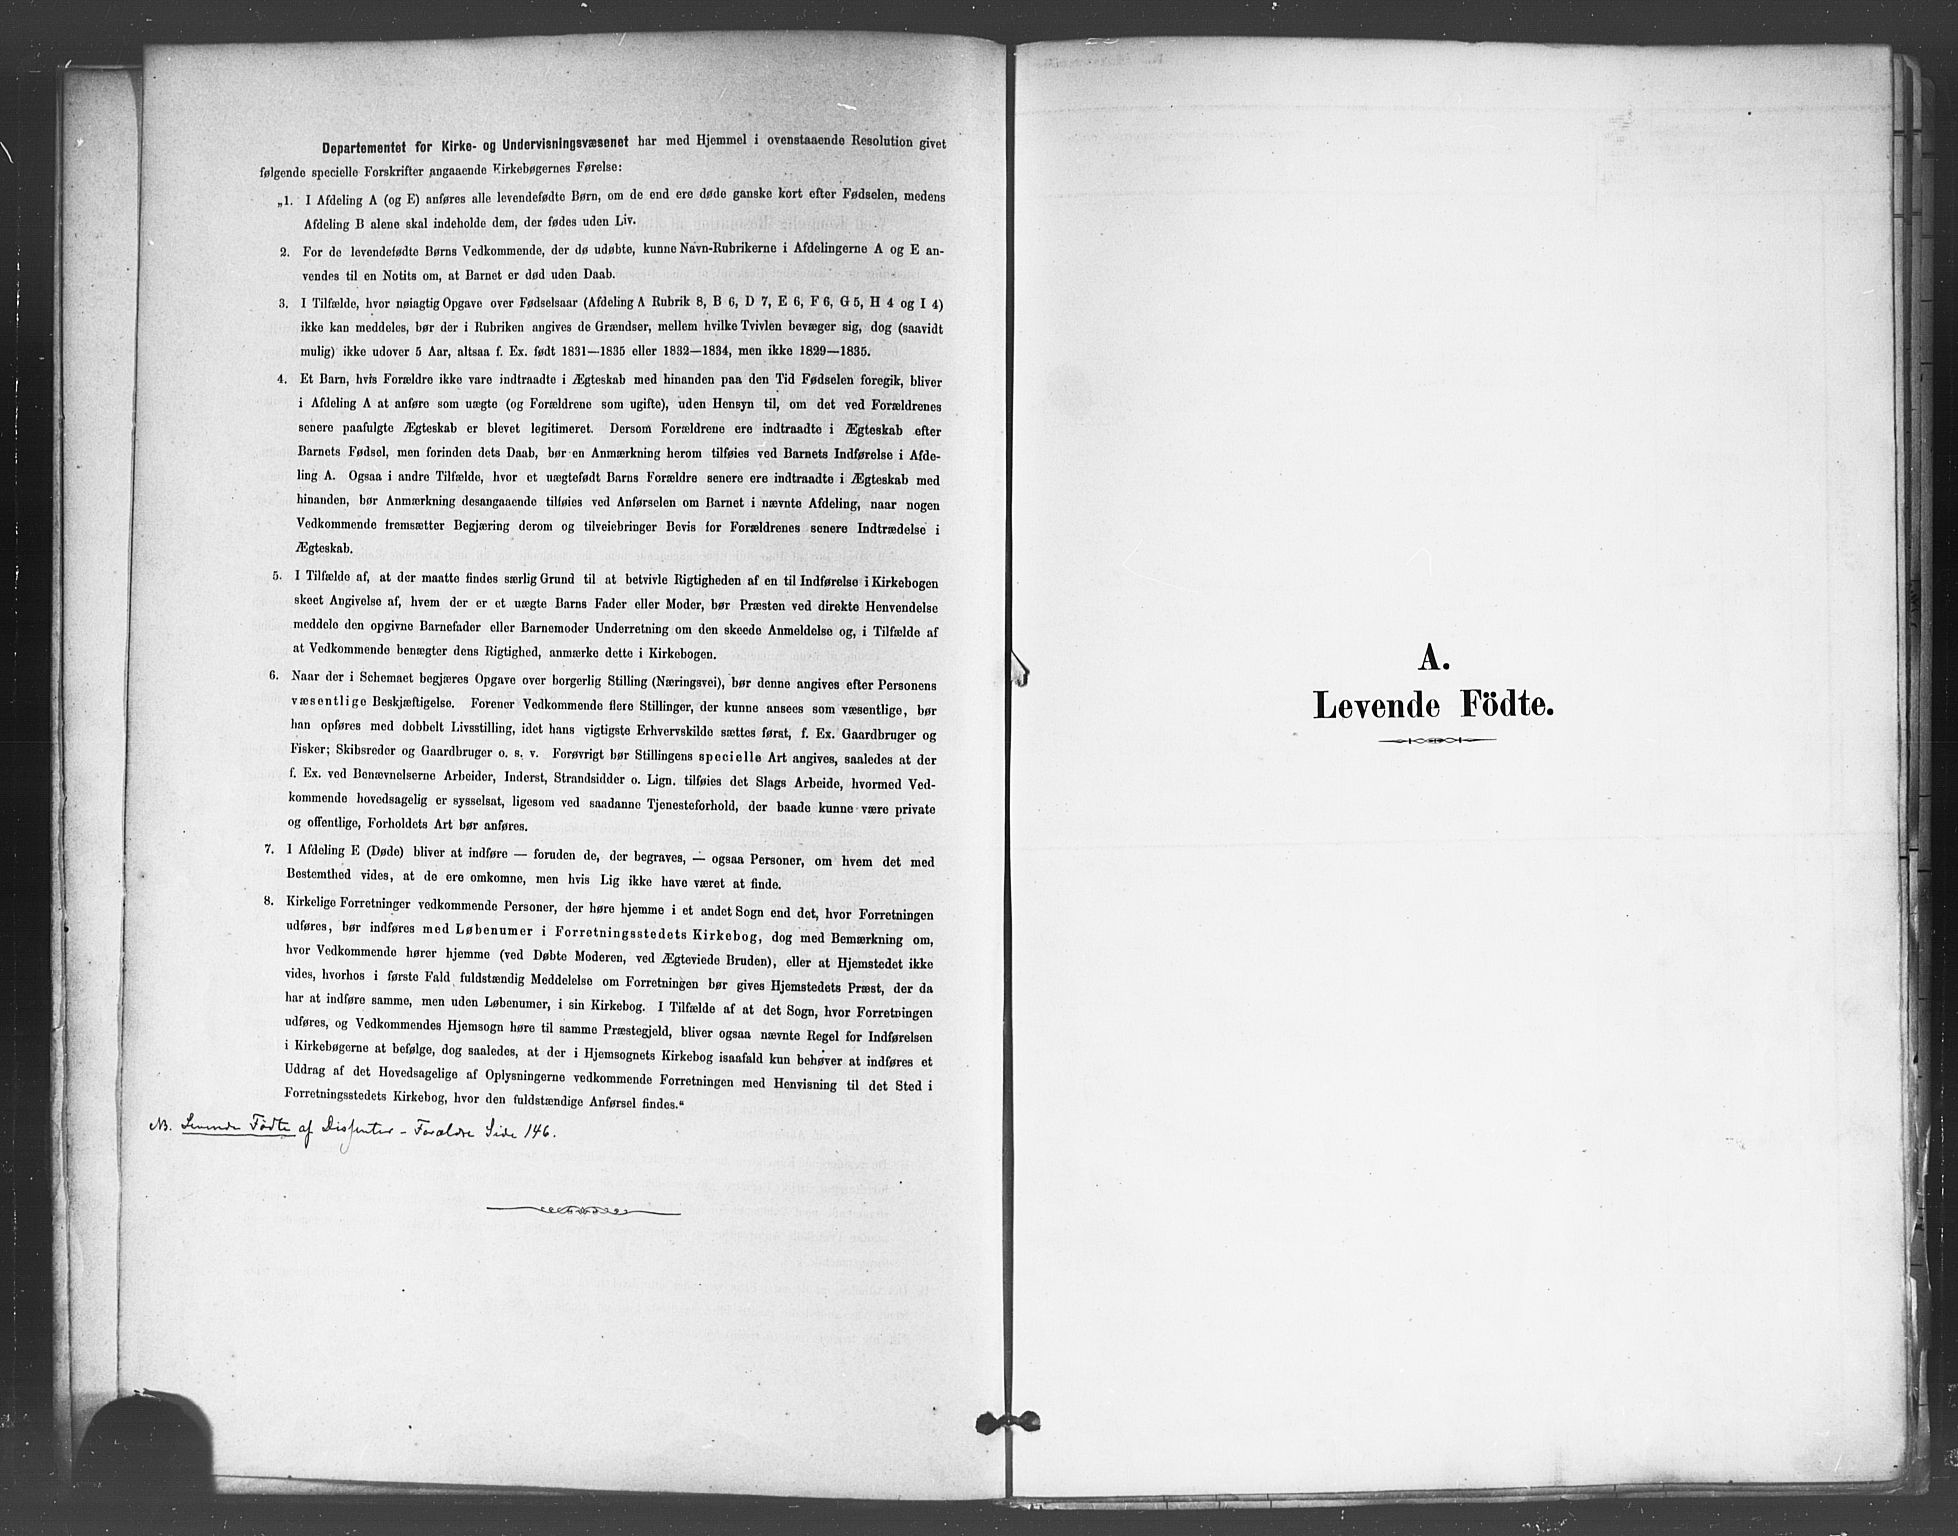 SAO, Petrus prestekontor Kirkebøker, F/Fa/L0001: Ministerialbok nr. 1, 1880-1887